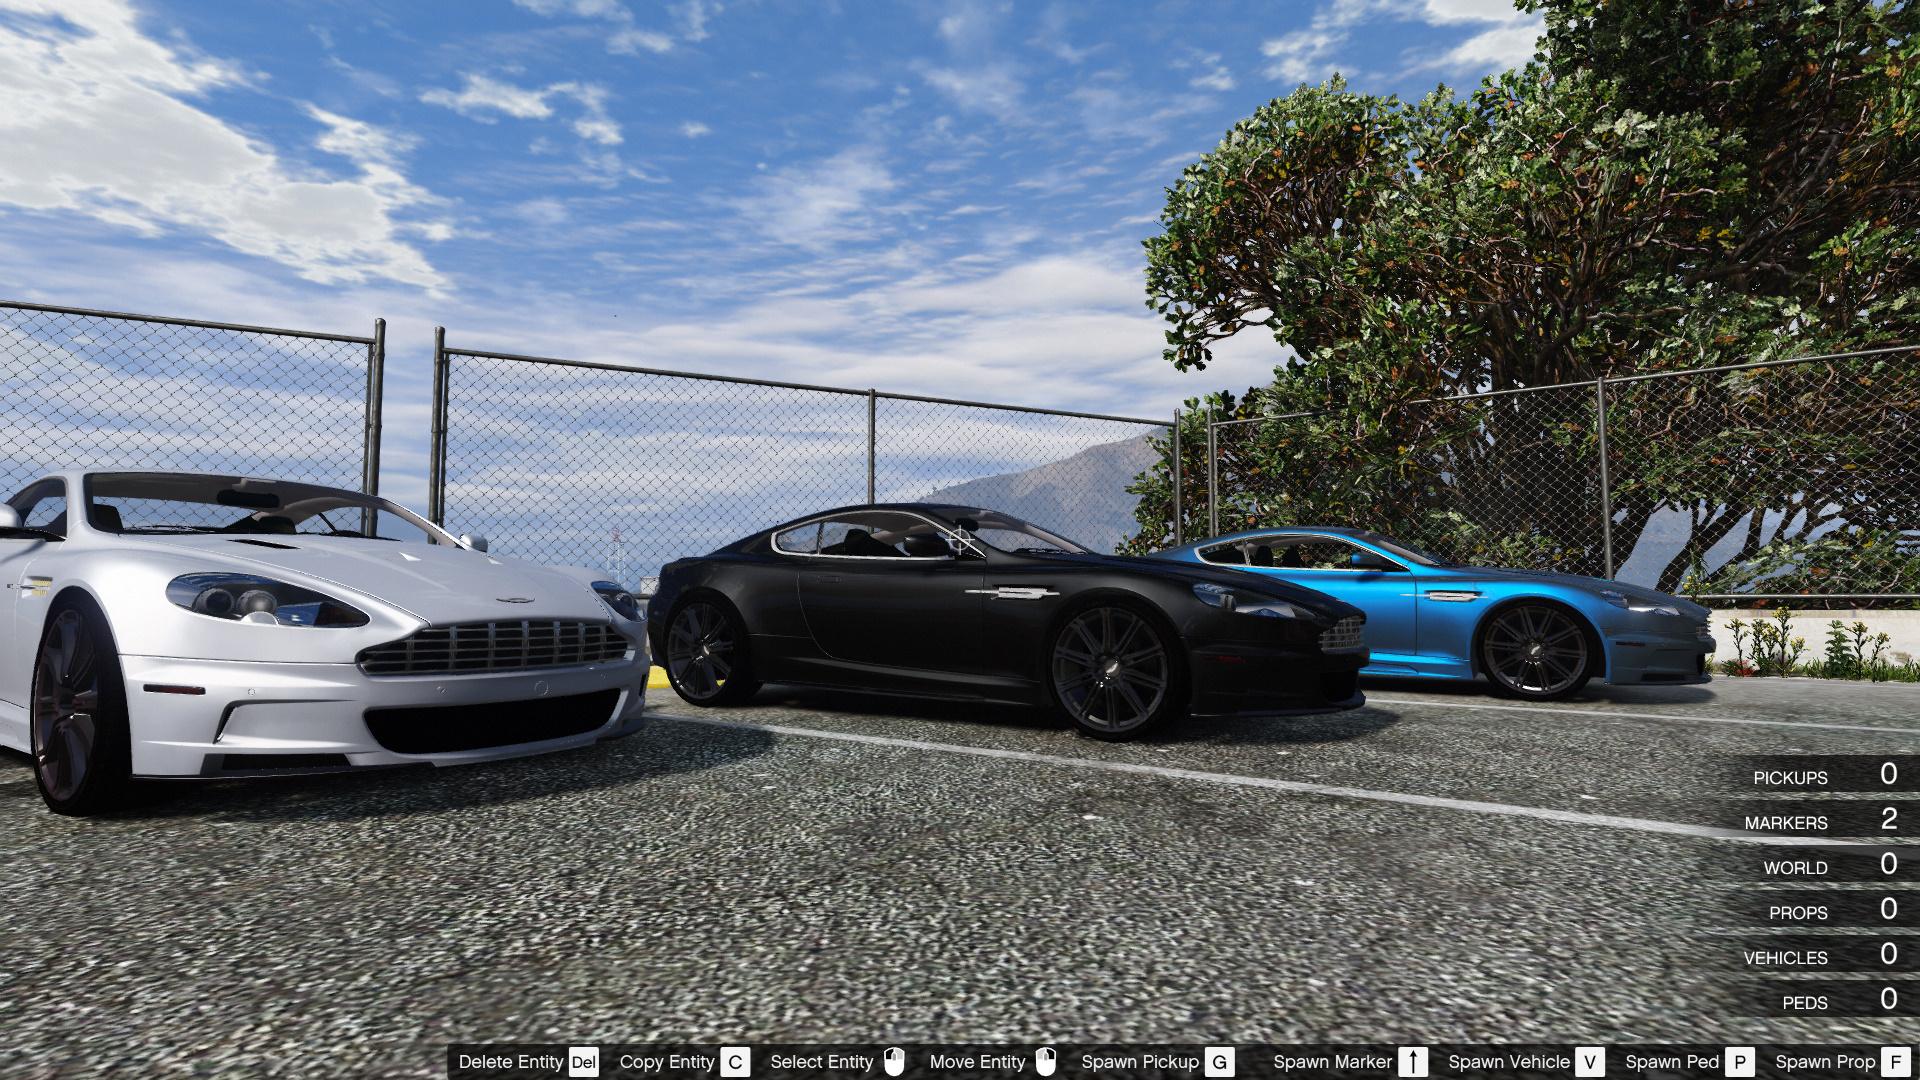 Aston Martin DBS 2008 [Add HQ 3D Engine] V4 0 GTA5 Mods